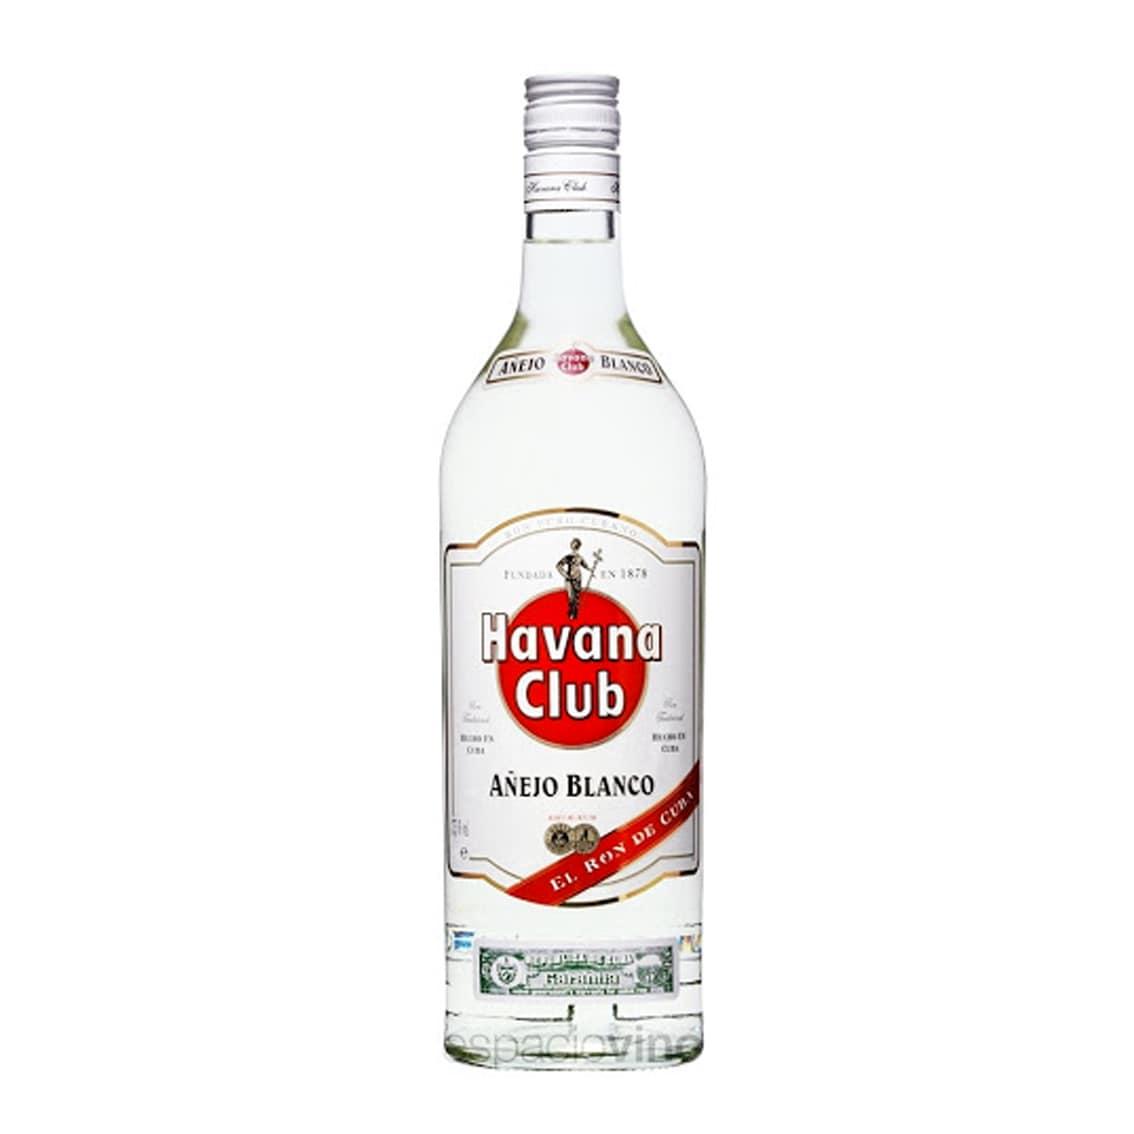 Ron HAVANA CLUB Añejo Blanco Botella 750ml